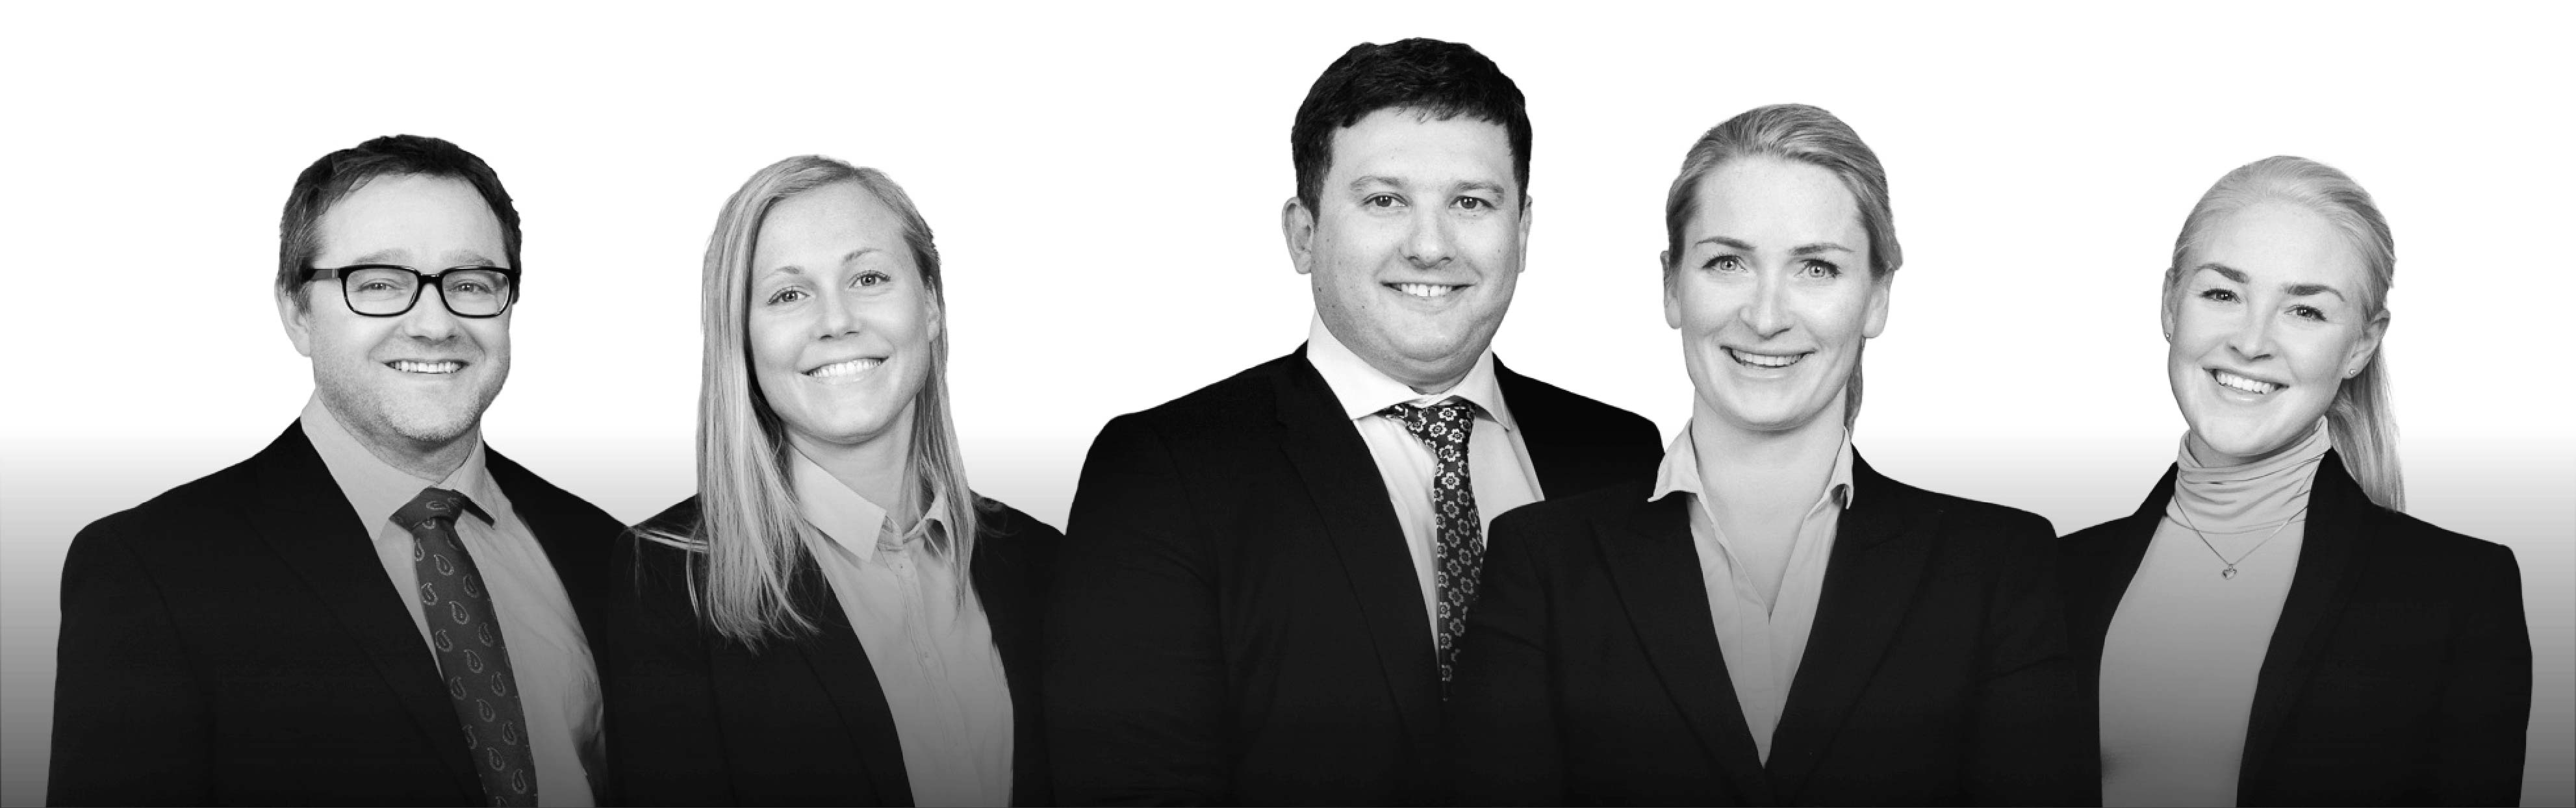 Advokat Oslo ansatte